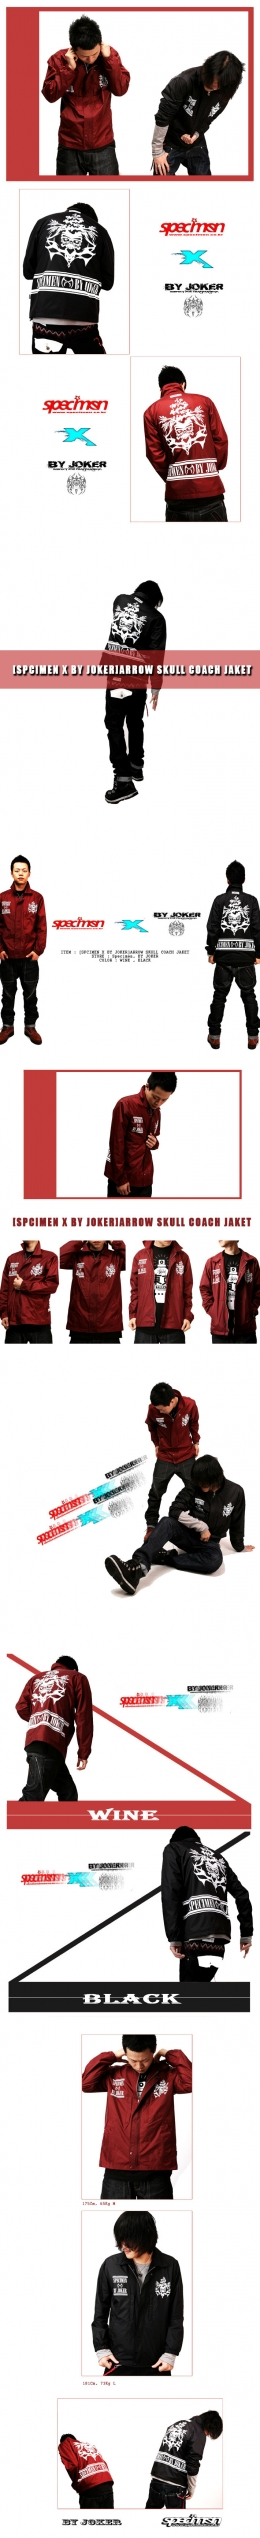 [BJ X SP]ARROW SKULL코치자켓 입고 및 재발매 안내.